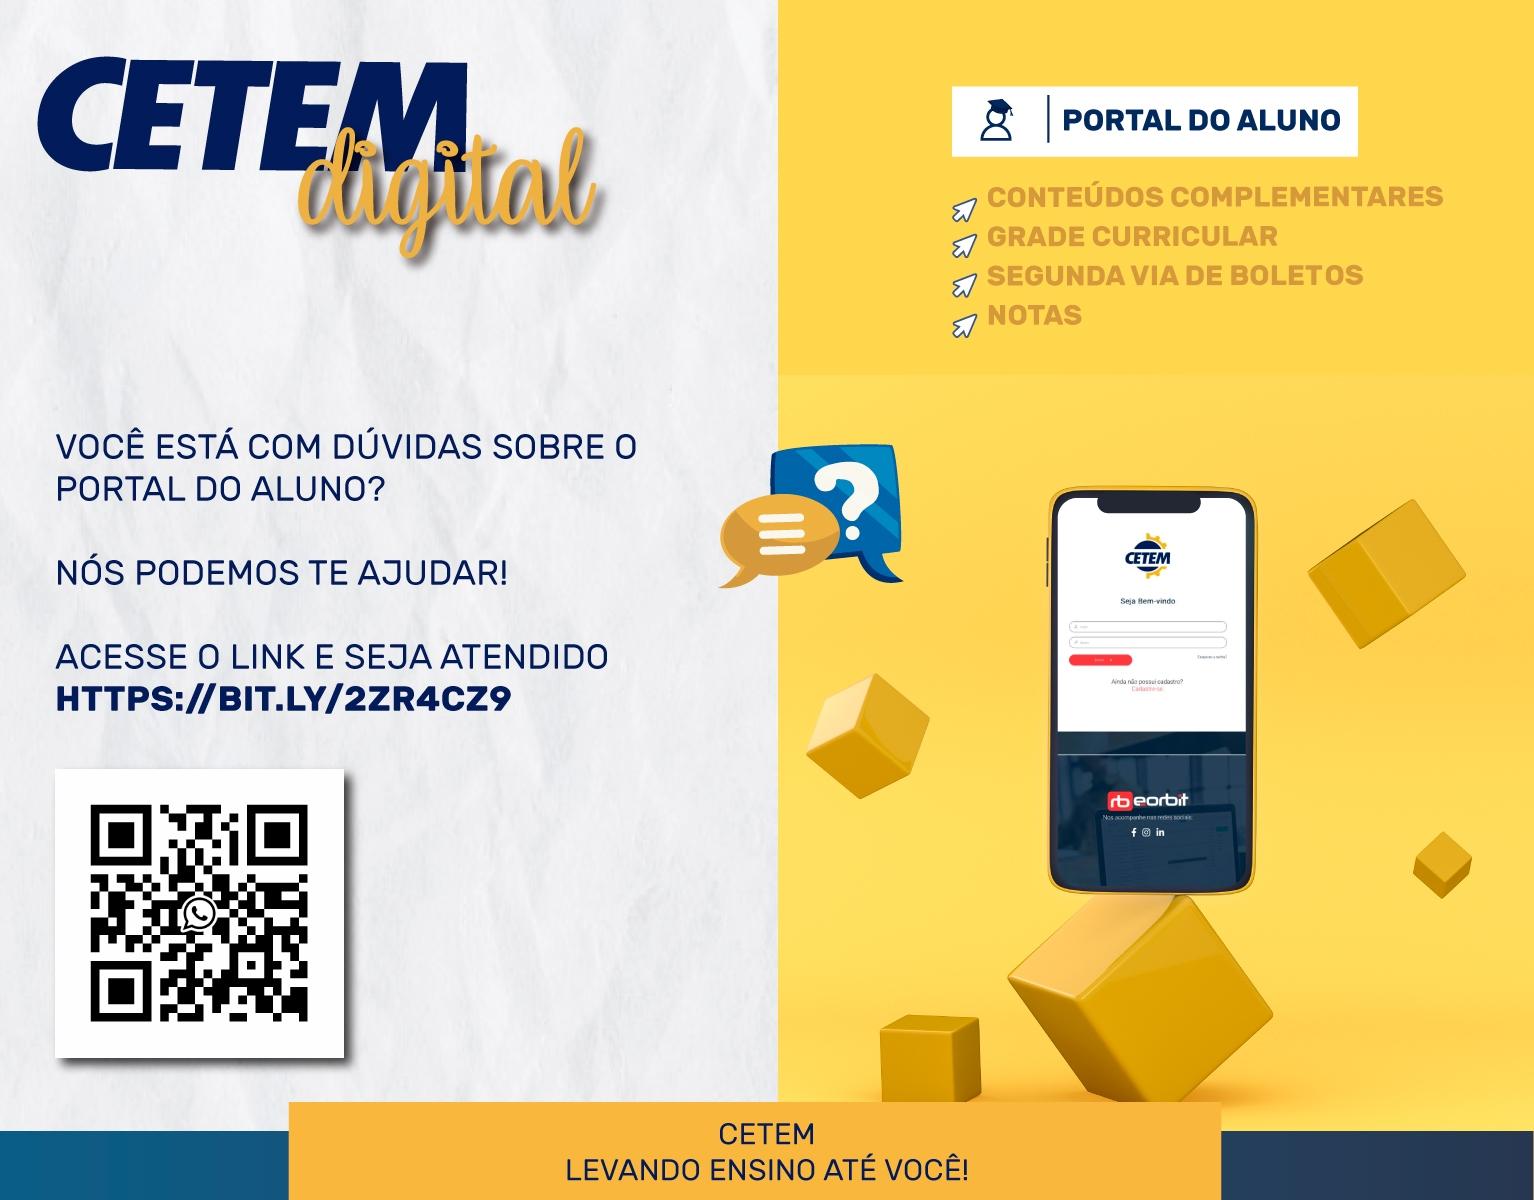 CETEM Digital: Suporte WhatsApp